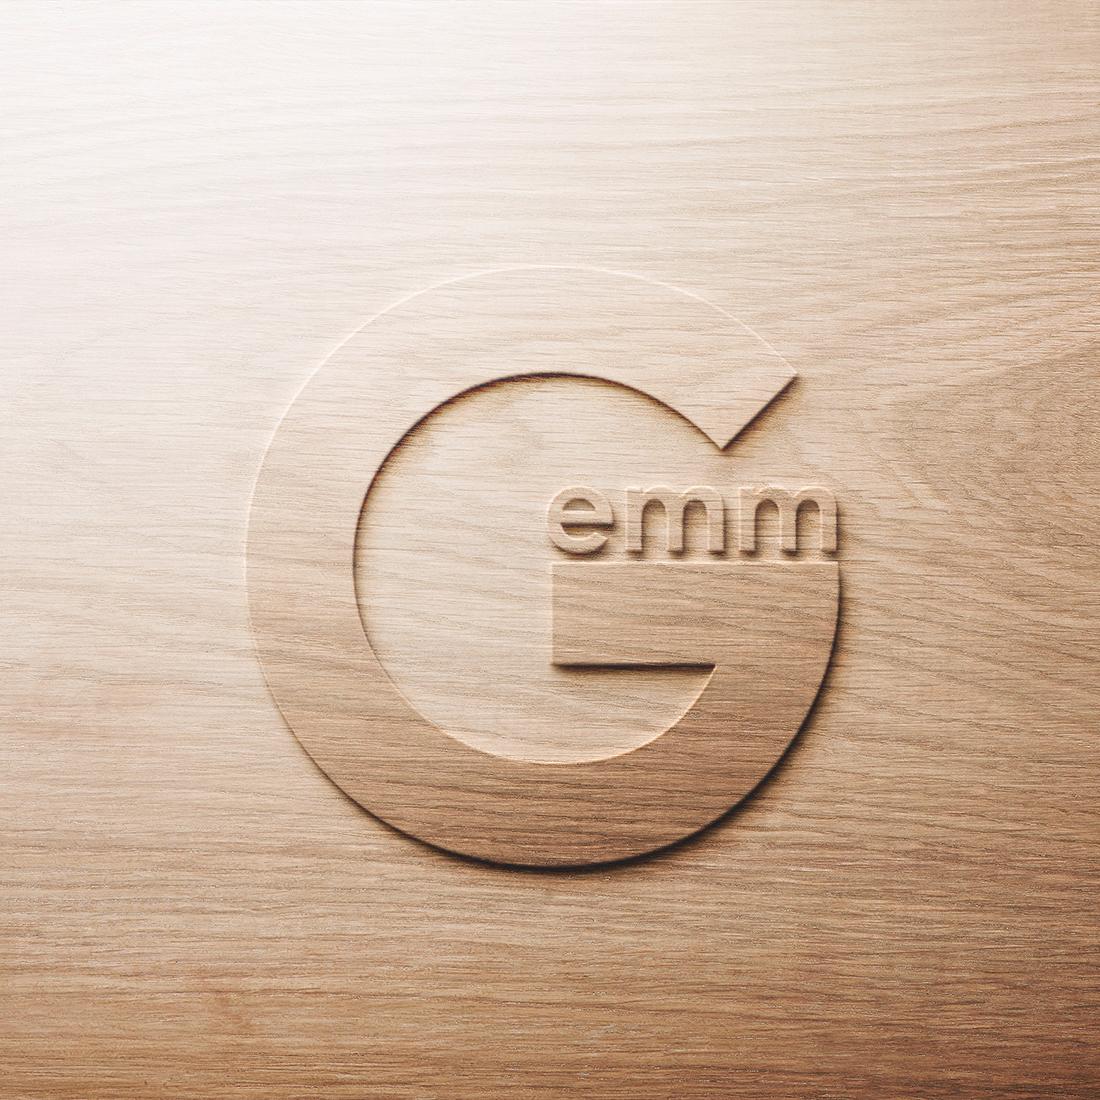 logo gemm